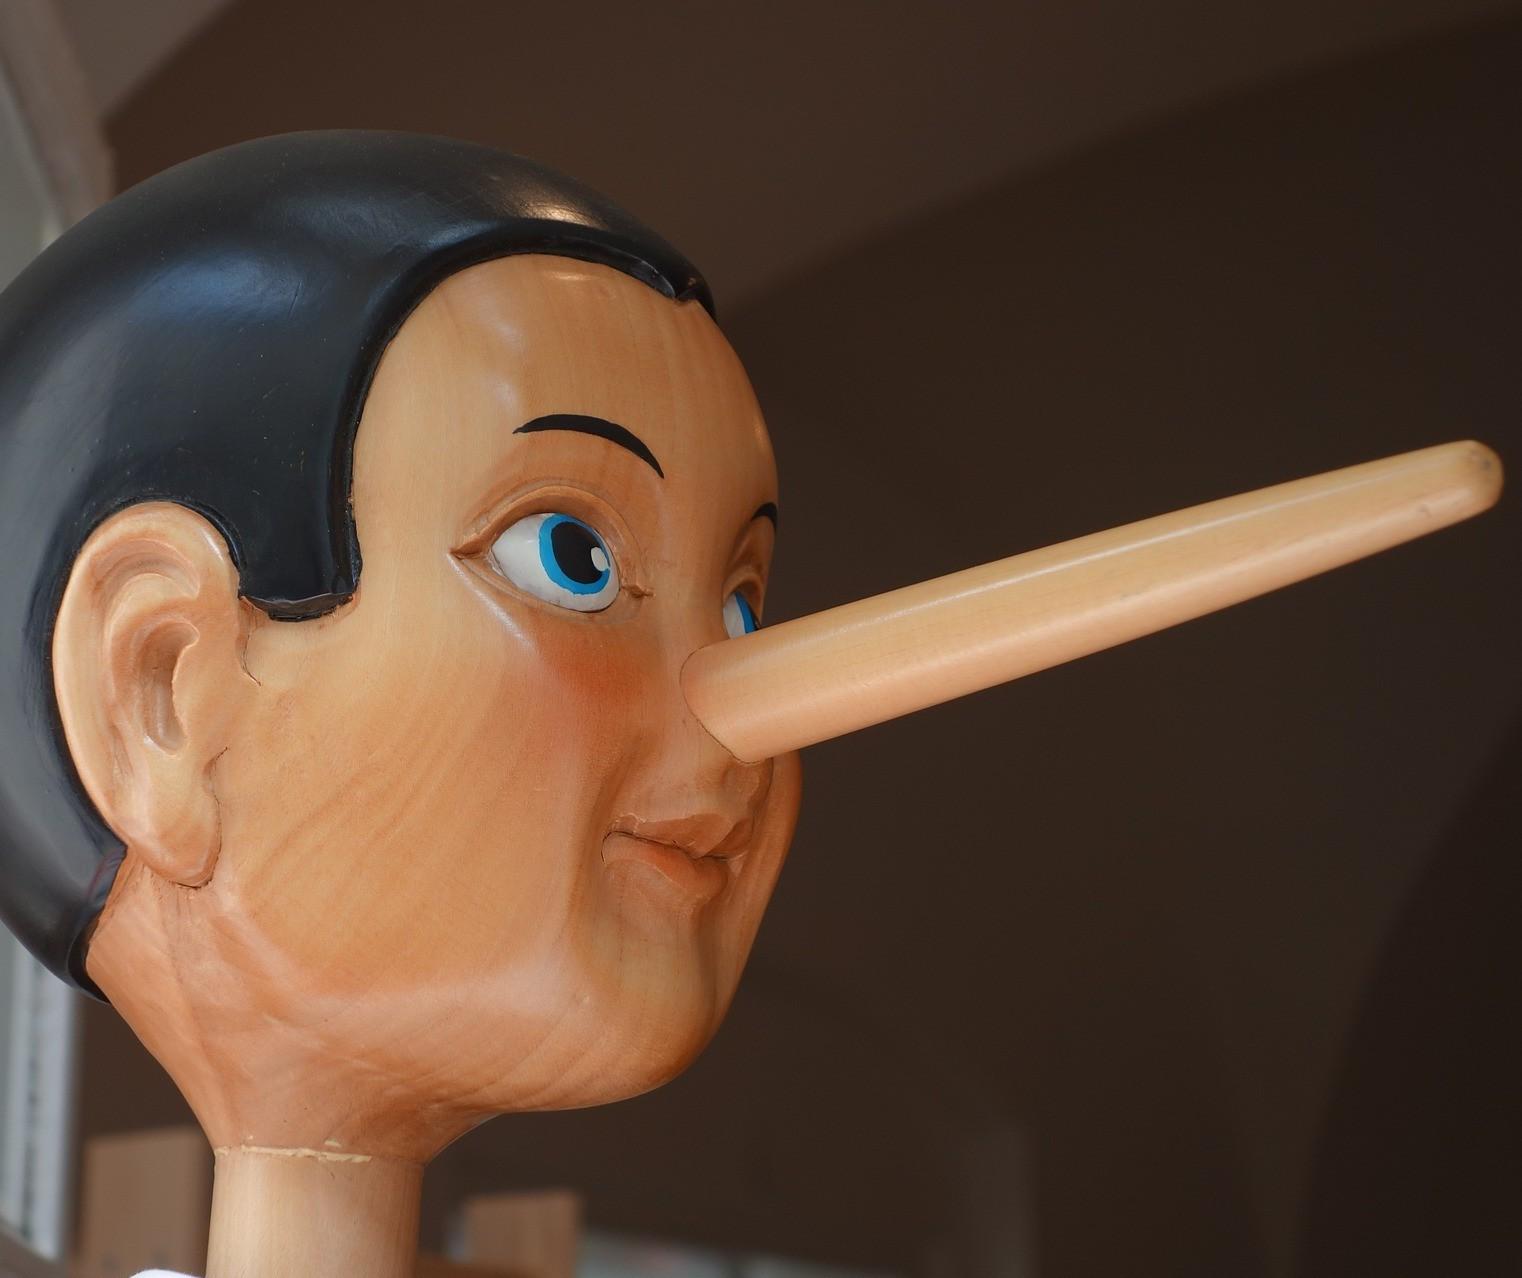 Sequestro da verdade